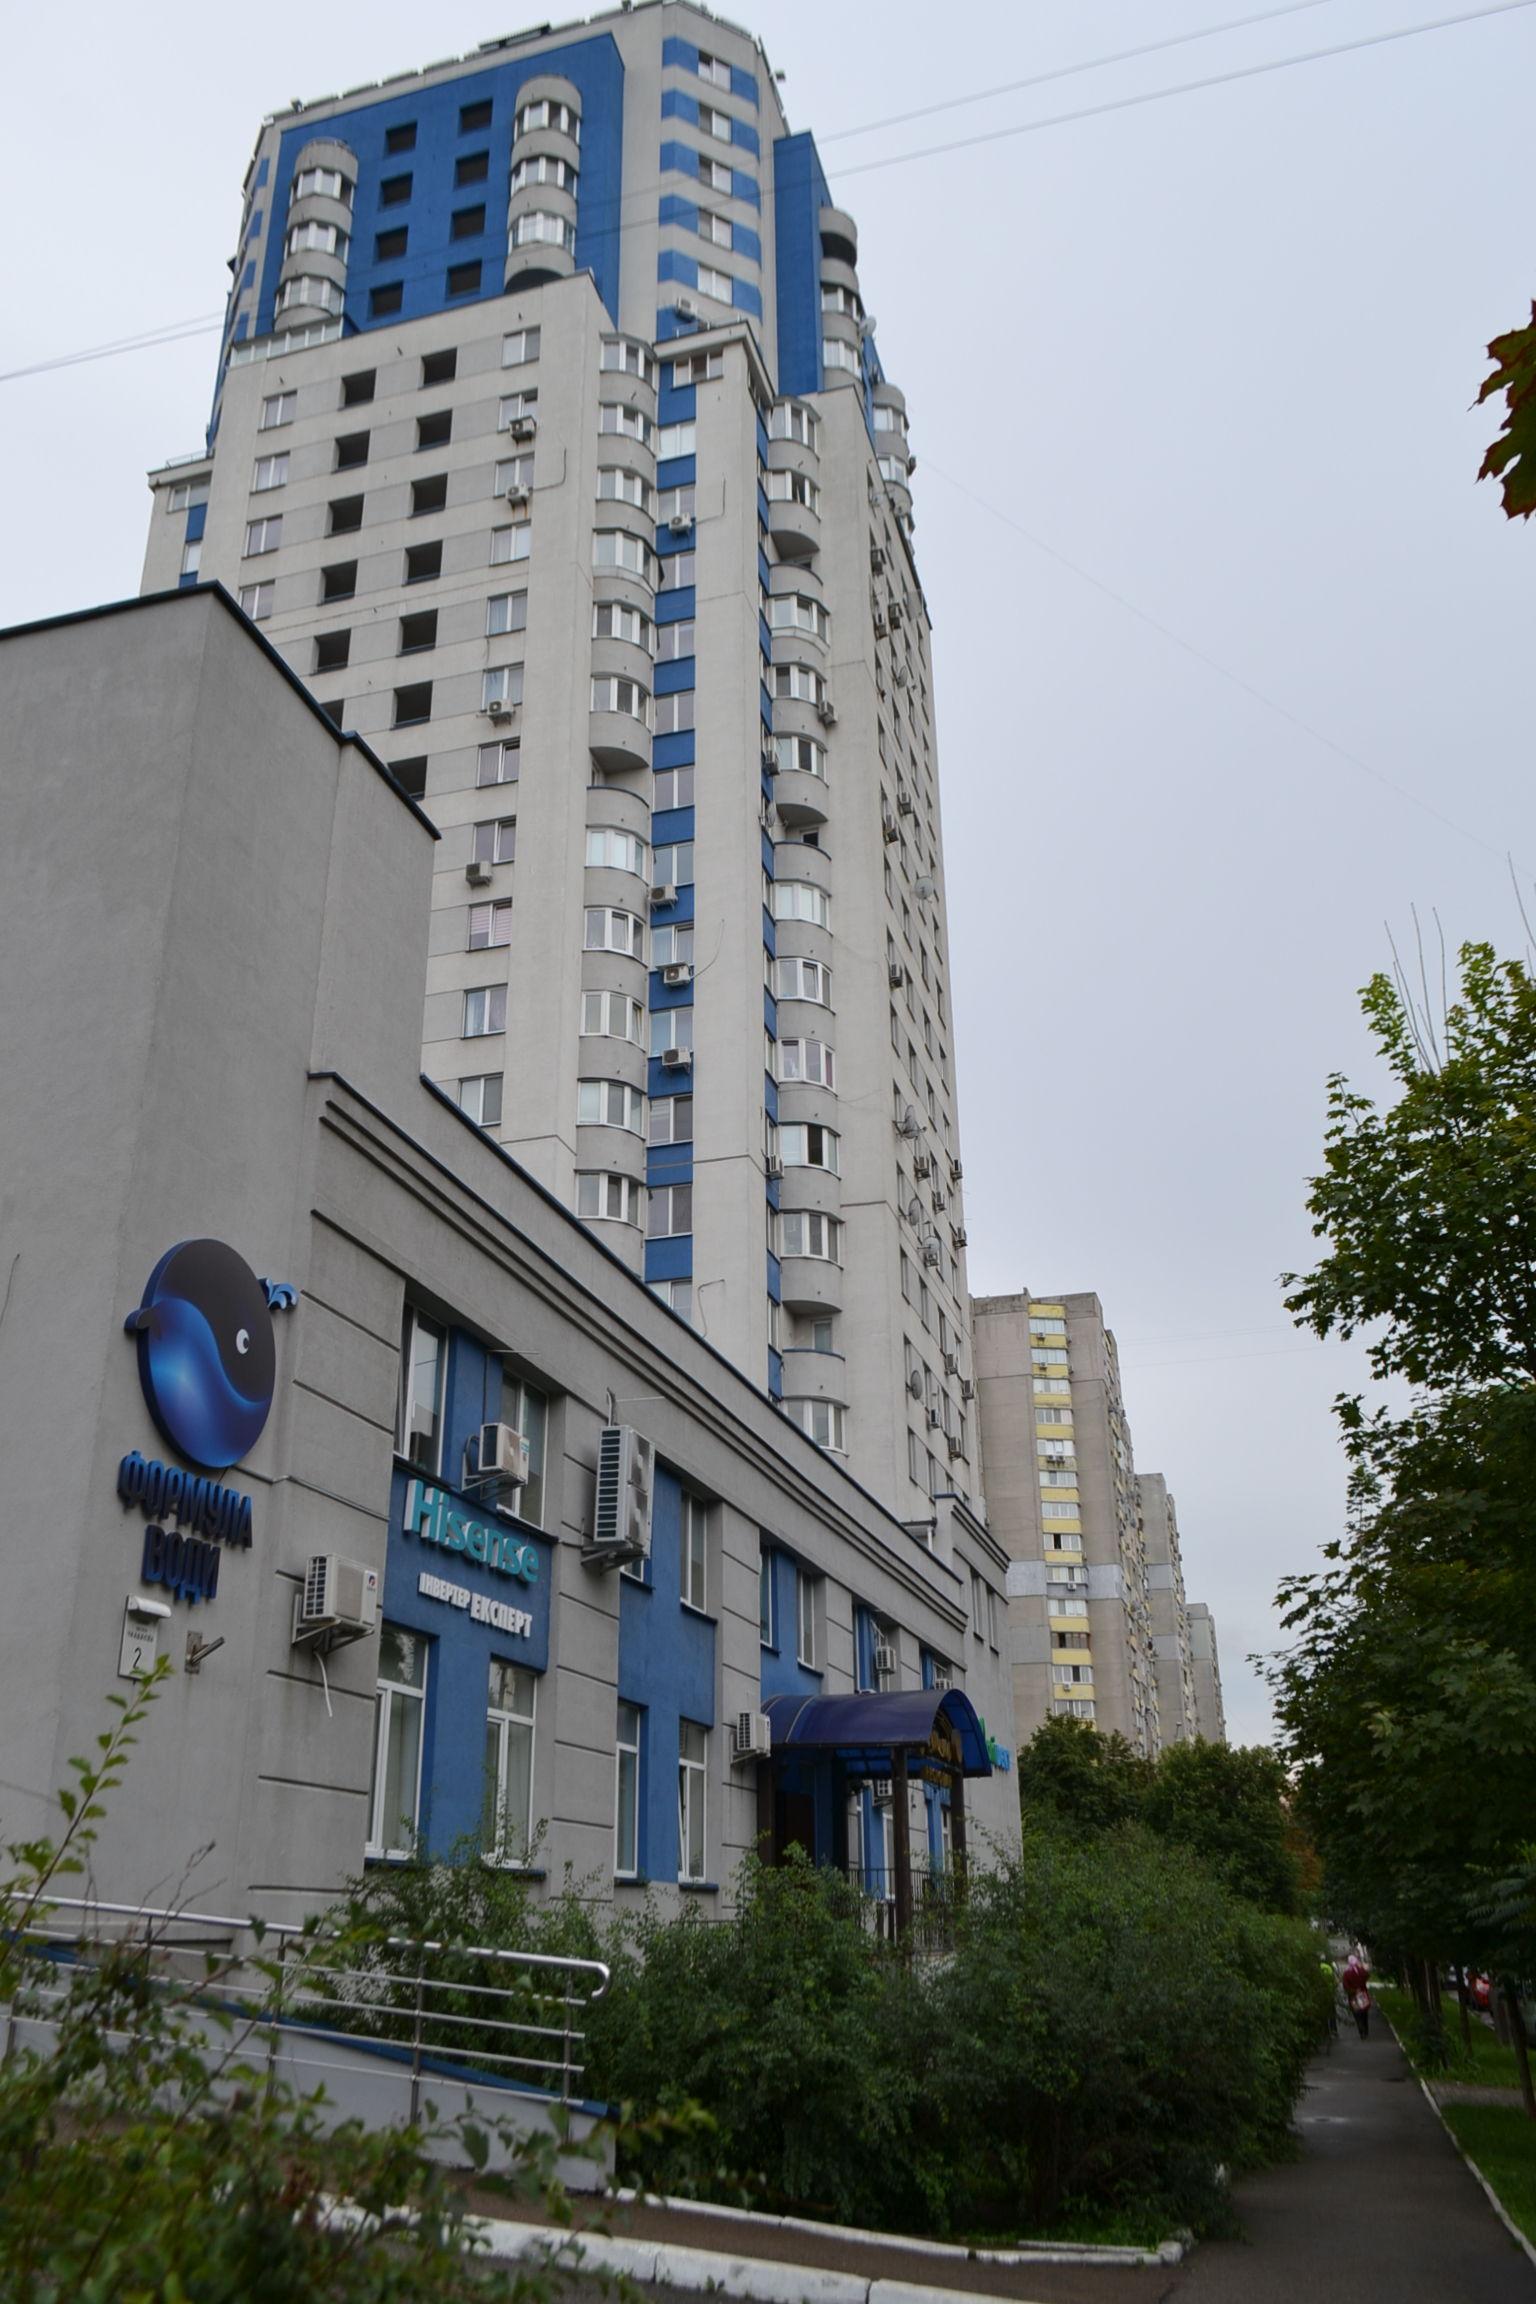 Ресторан, W-5563321, Чаадаева Петра, 2, Киев - Фото 13